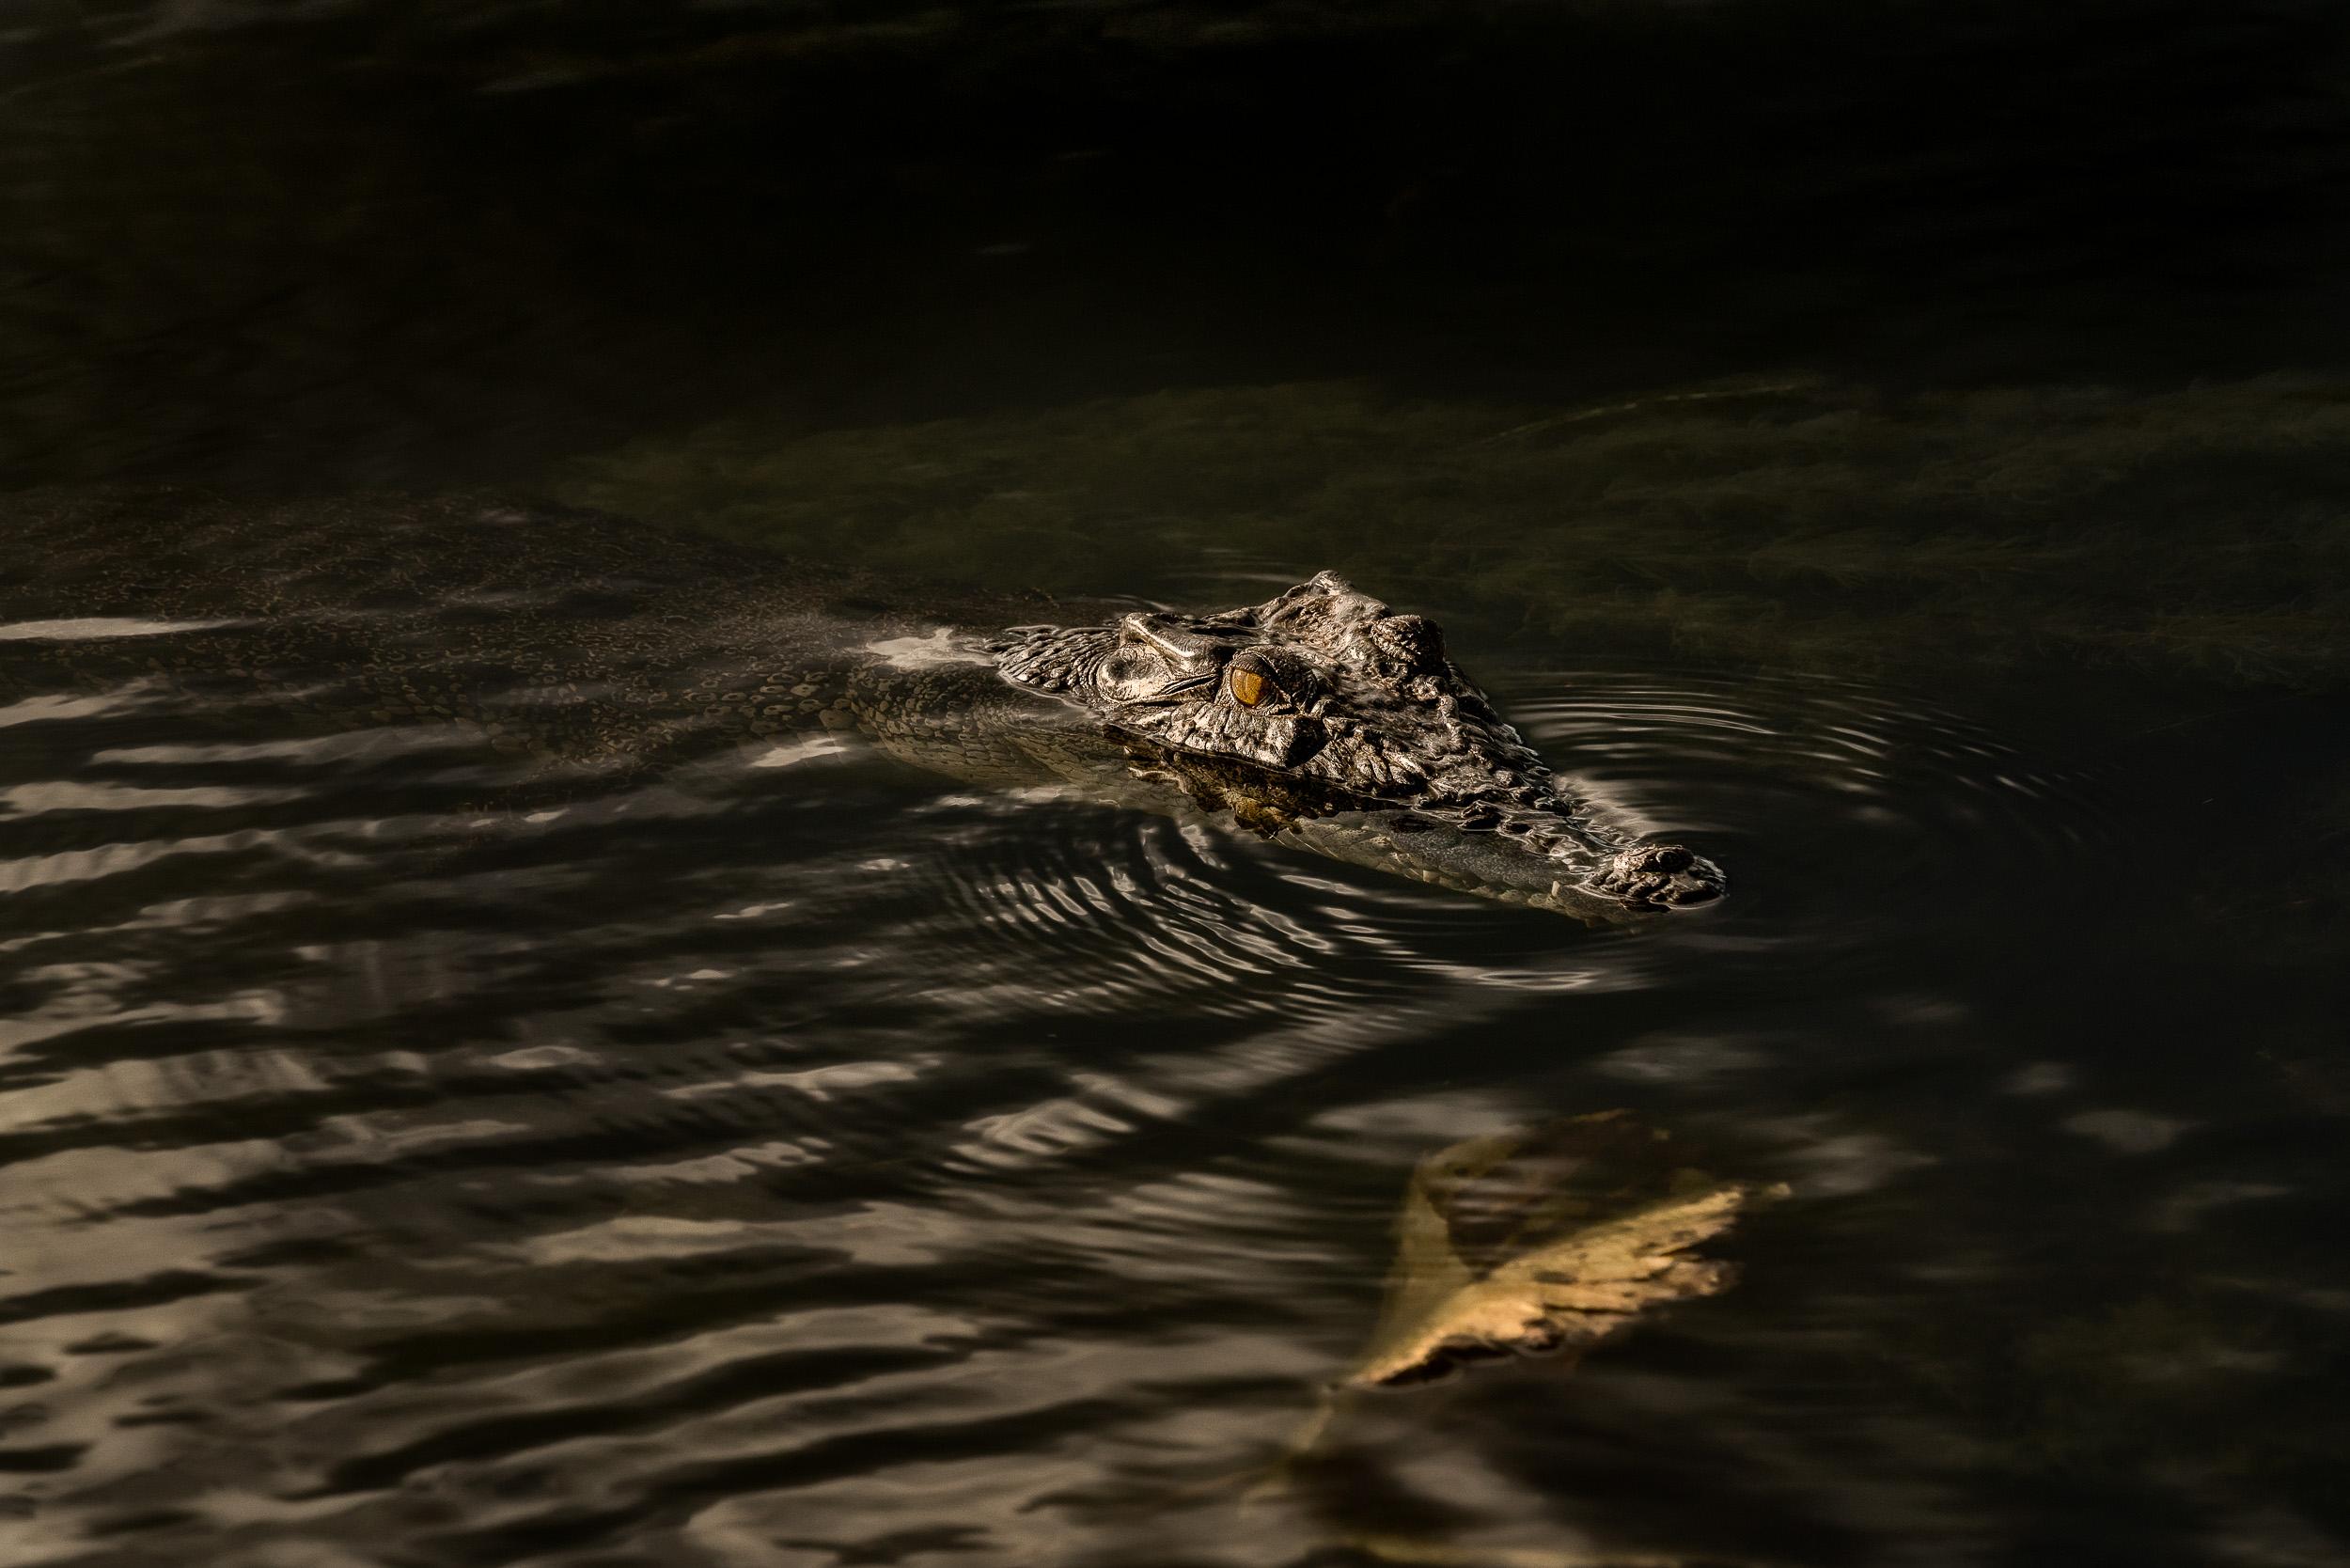 An  inquesitive crocodile  in the  Yellow Waters Billabong ,  Kakadu National Park, Australia .